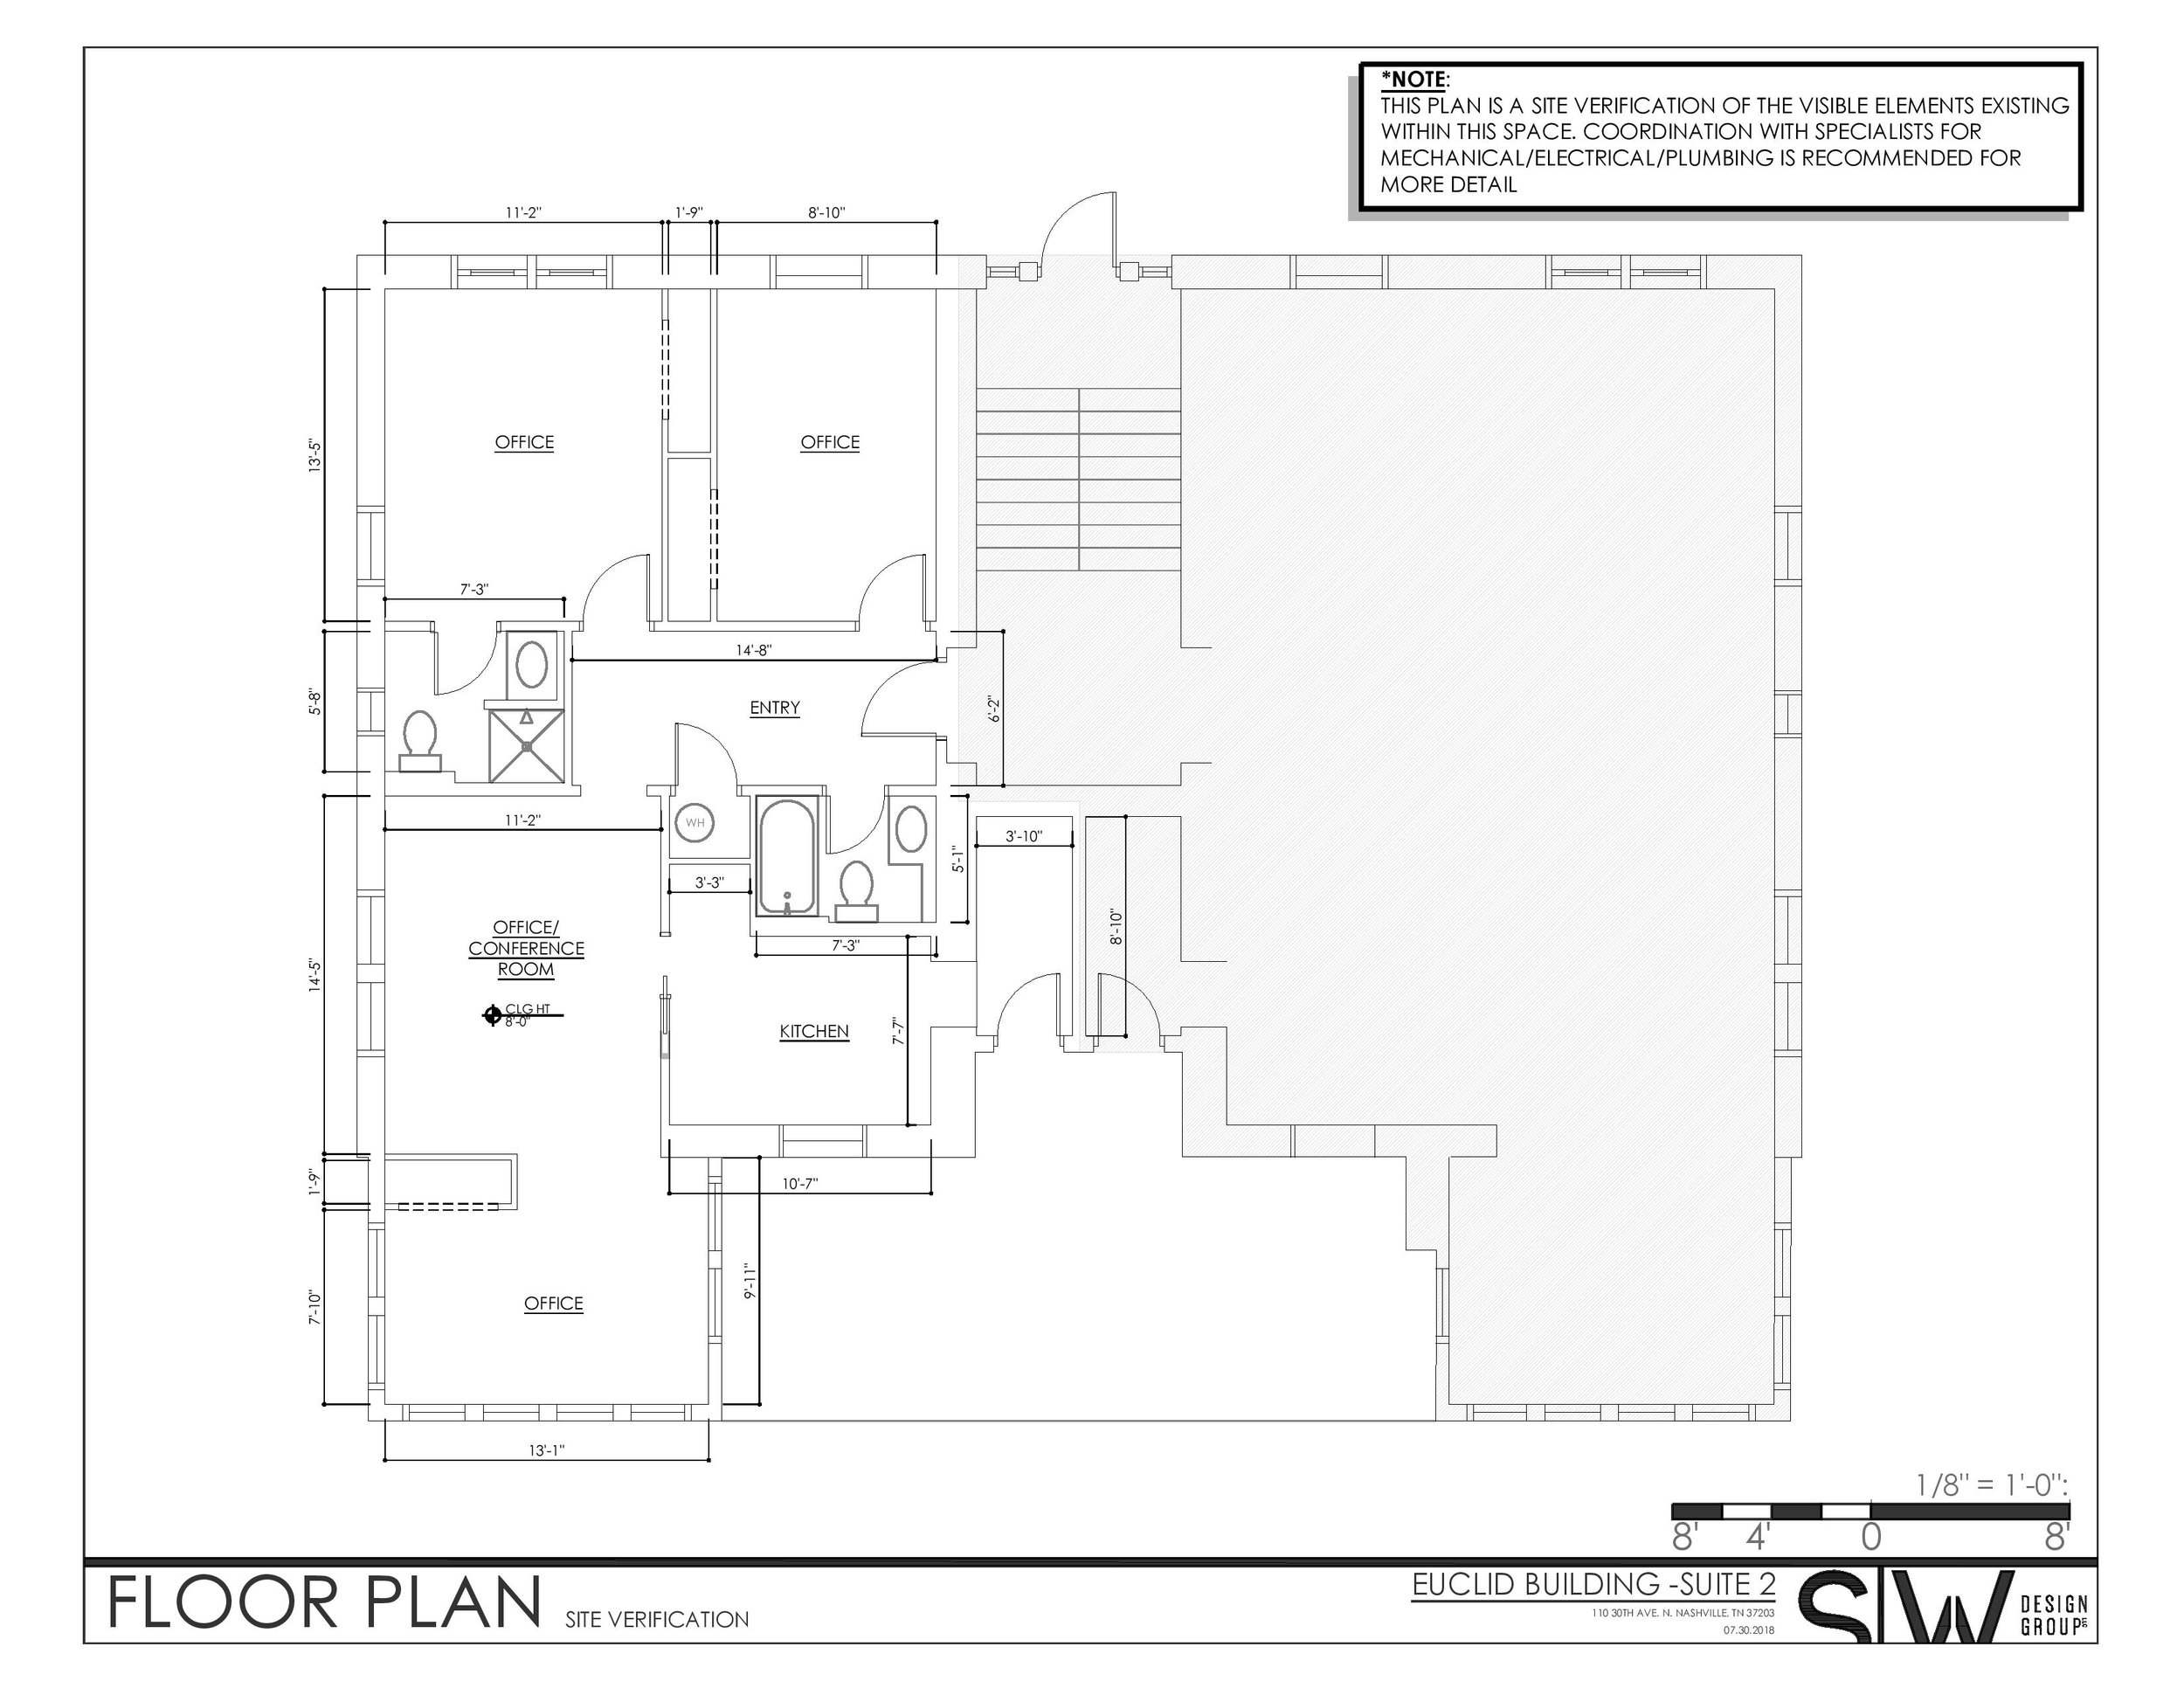 Suite-2-Field-Verification-1-page-001-1.jpg